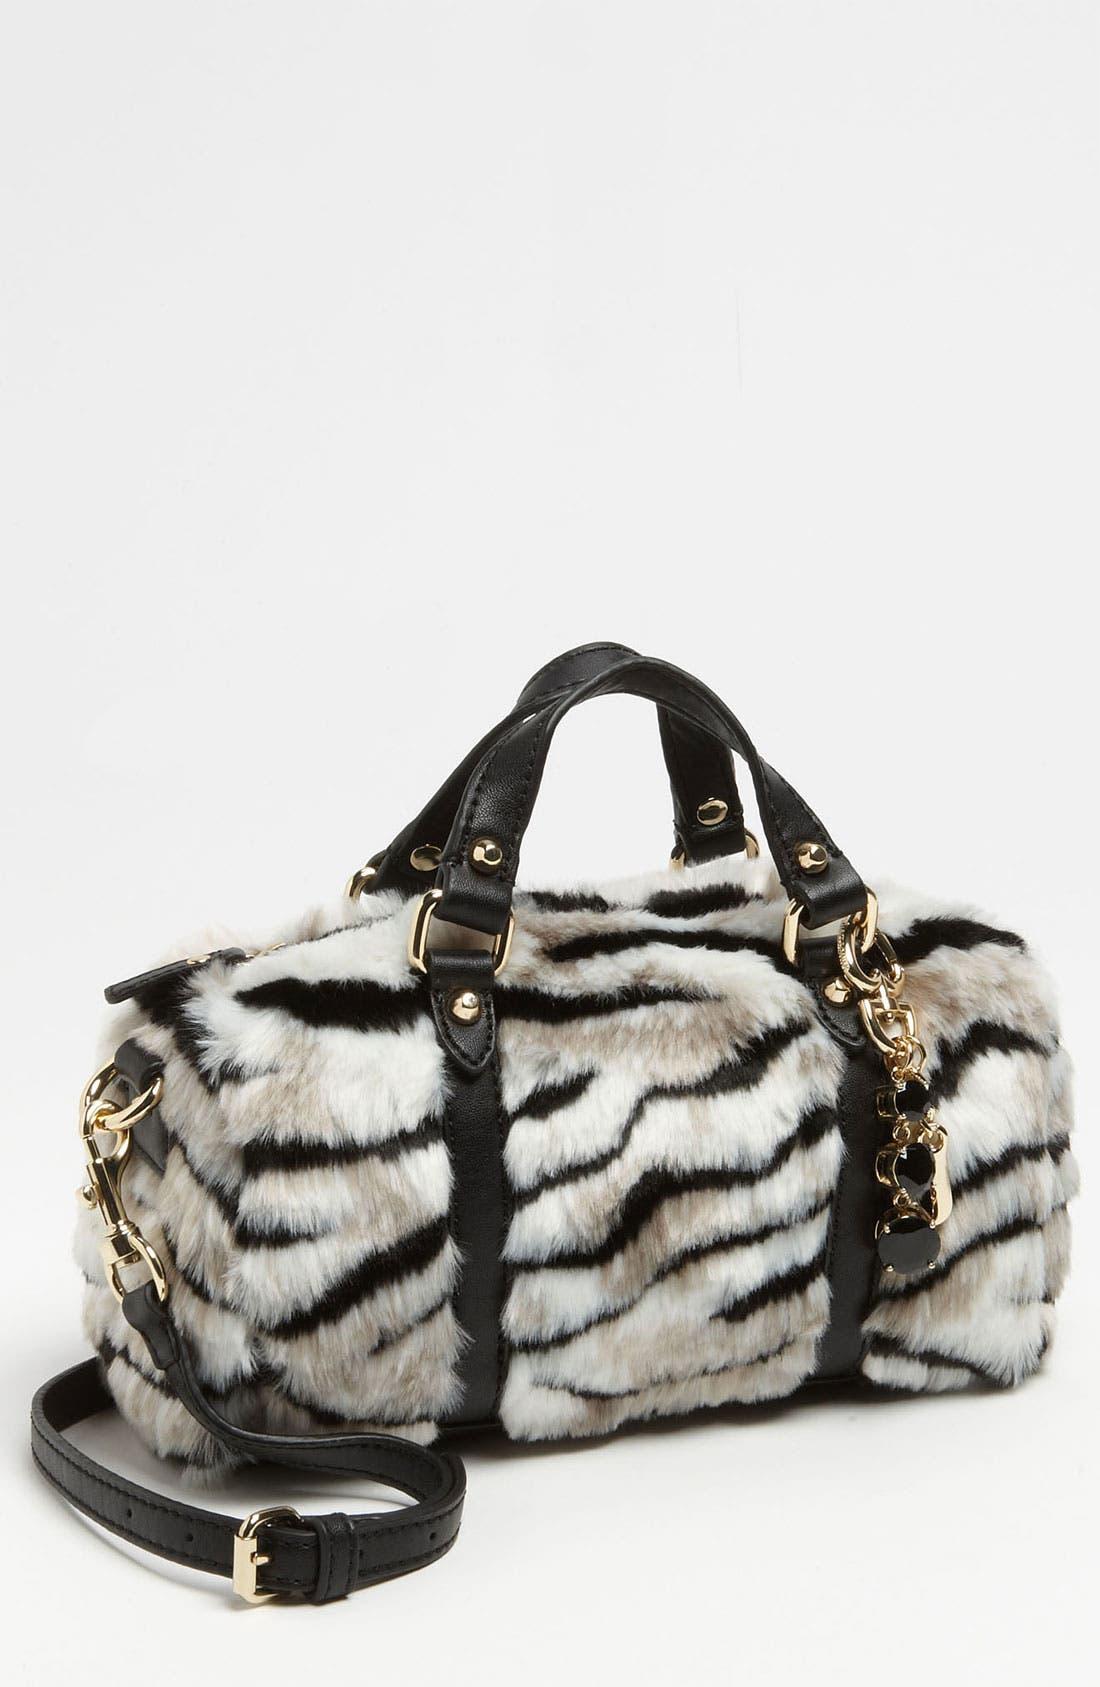 Alternate Image 1 Selected - Juicy Couture 'Mini Steffy' Faux Fur Satchel (Girls)